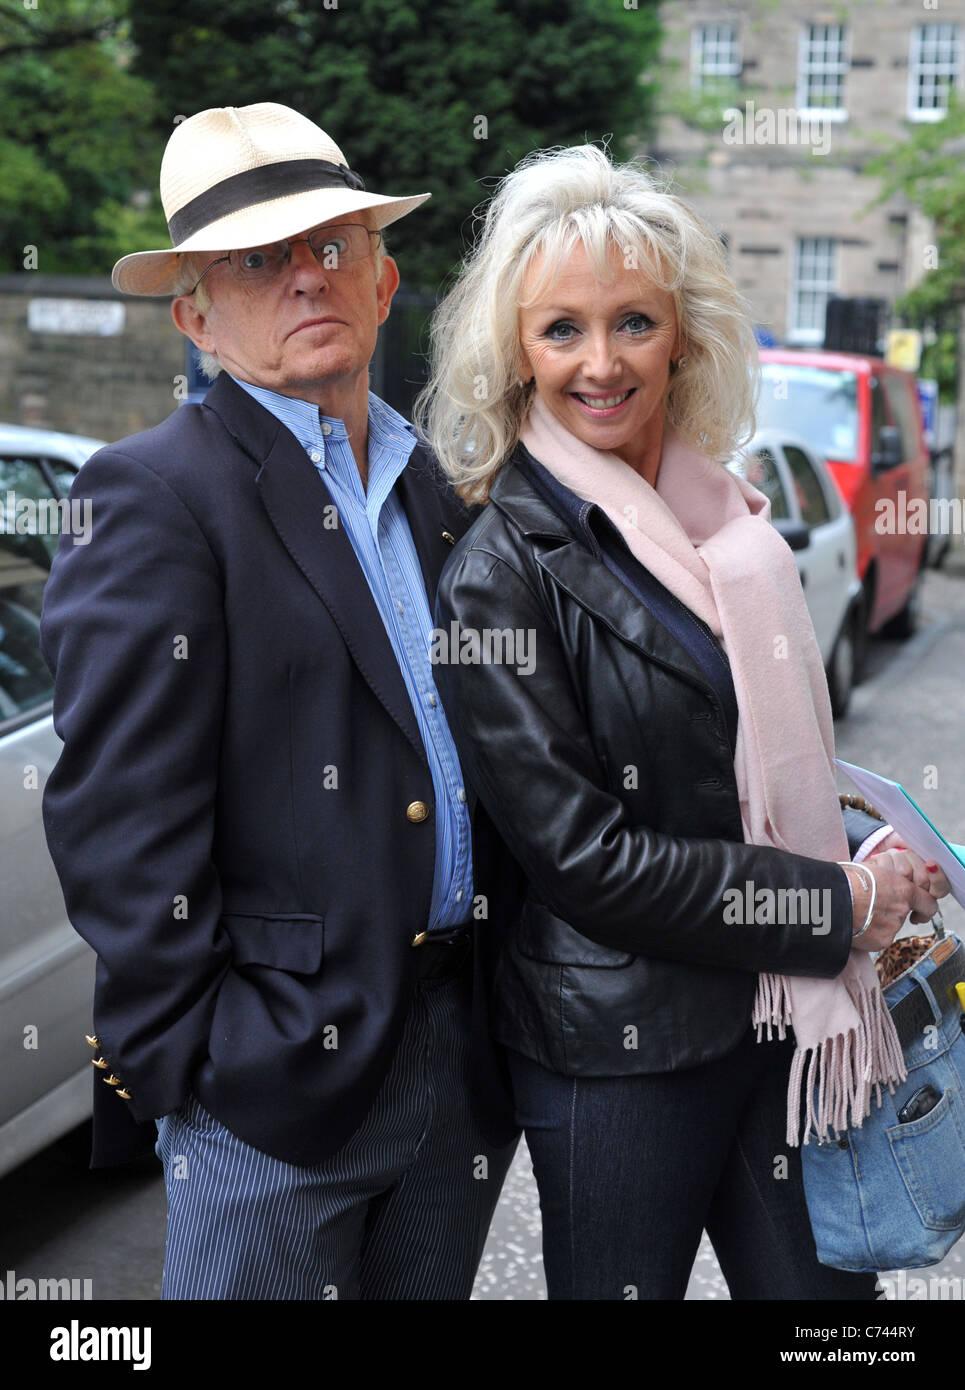 Paul Daniels,Debbie McGee,Edinburgh Fringe Festival,Scotland,2011 - Stock Image